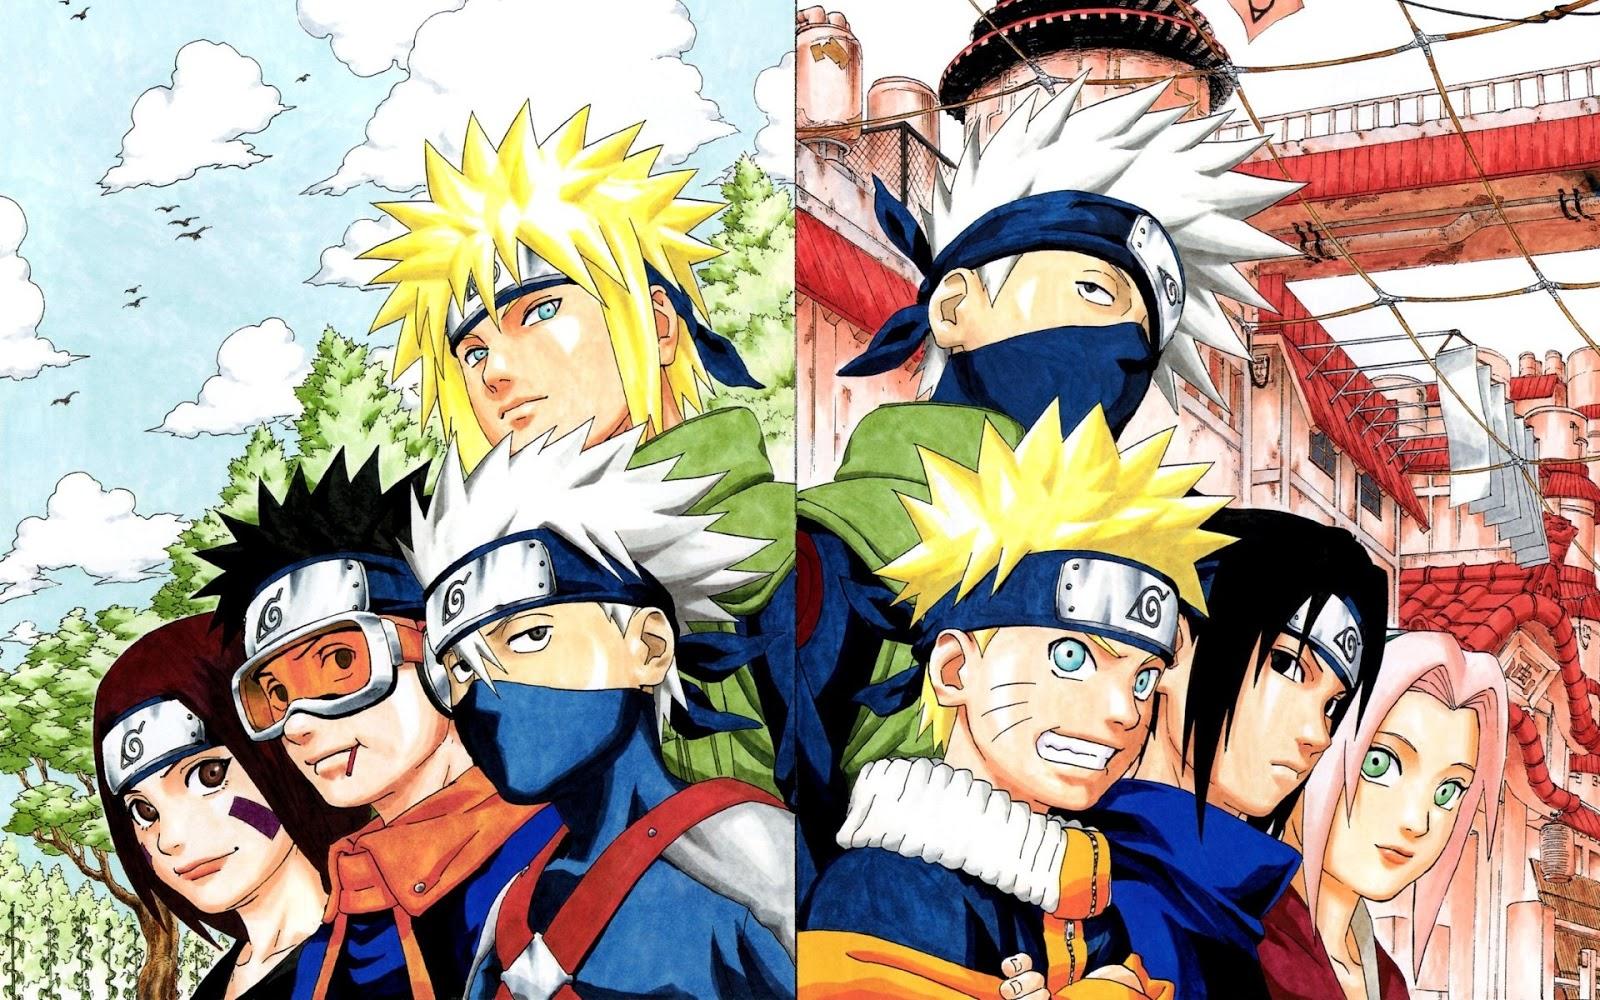 Kumpulan Wallpaper Naruto Hd Lengkap Terbaru Saku Share